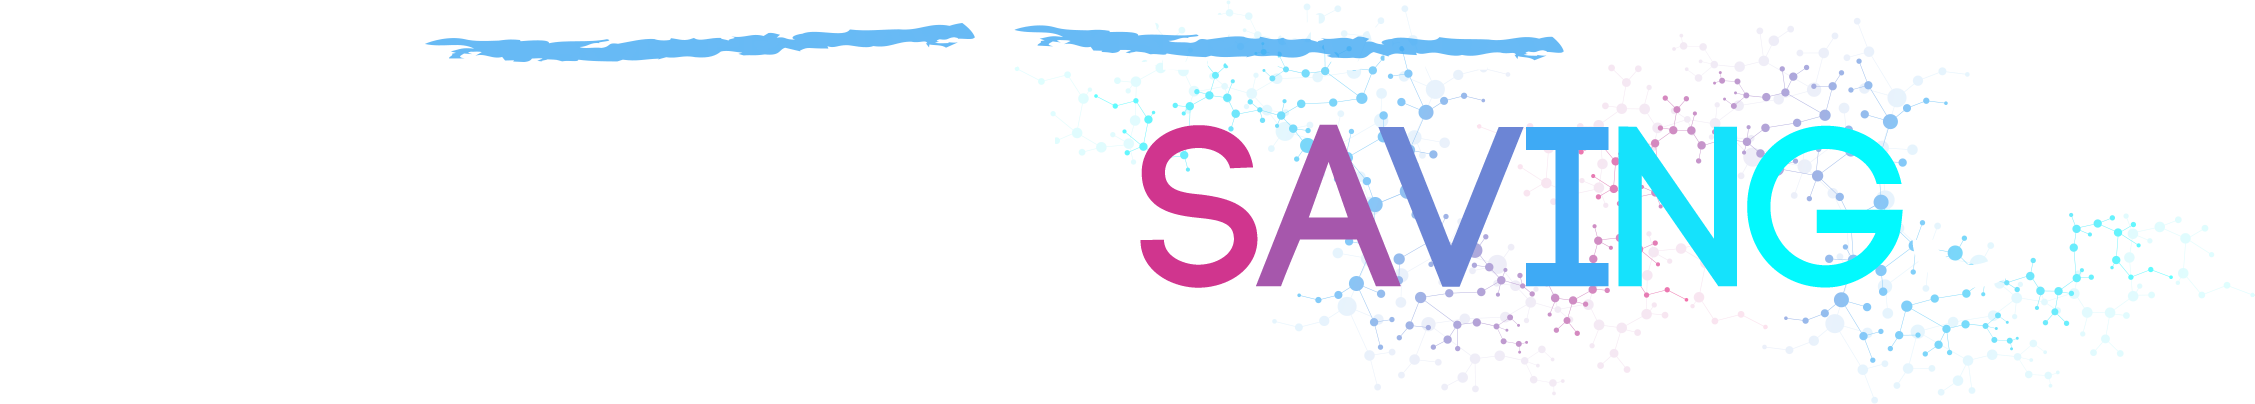 7 Days of Technology